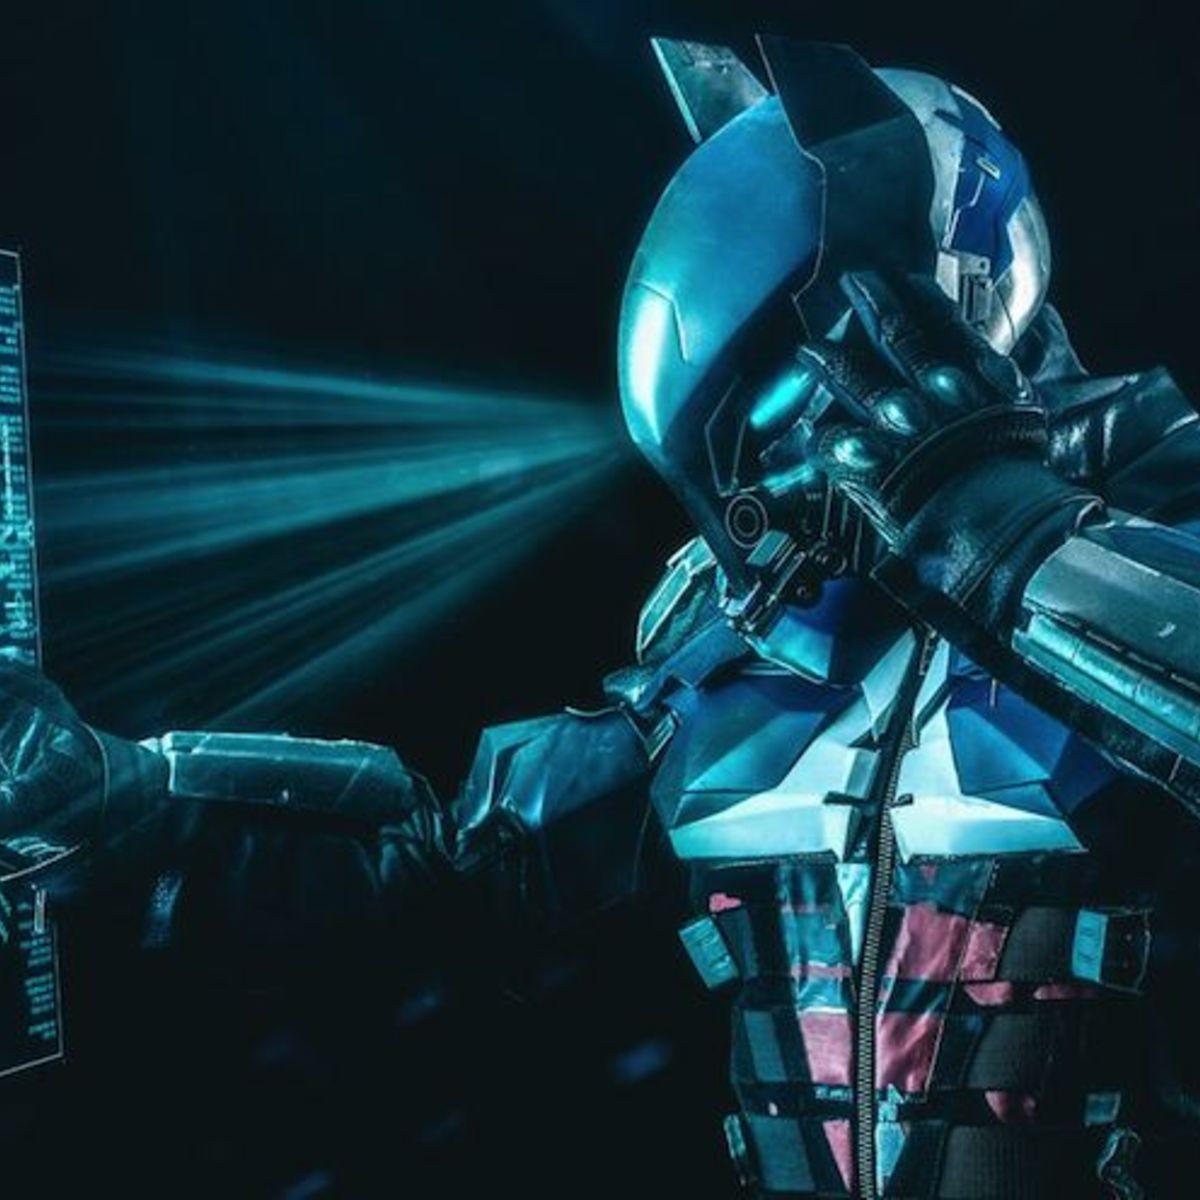 arkham-knight-cosplay-lucas-ambrosio-04-1.jpg